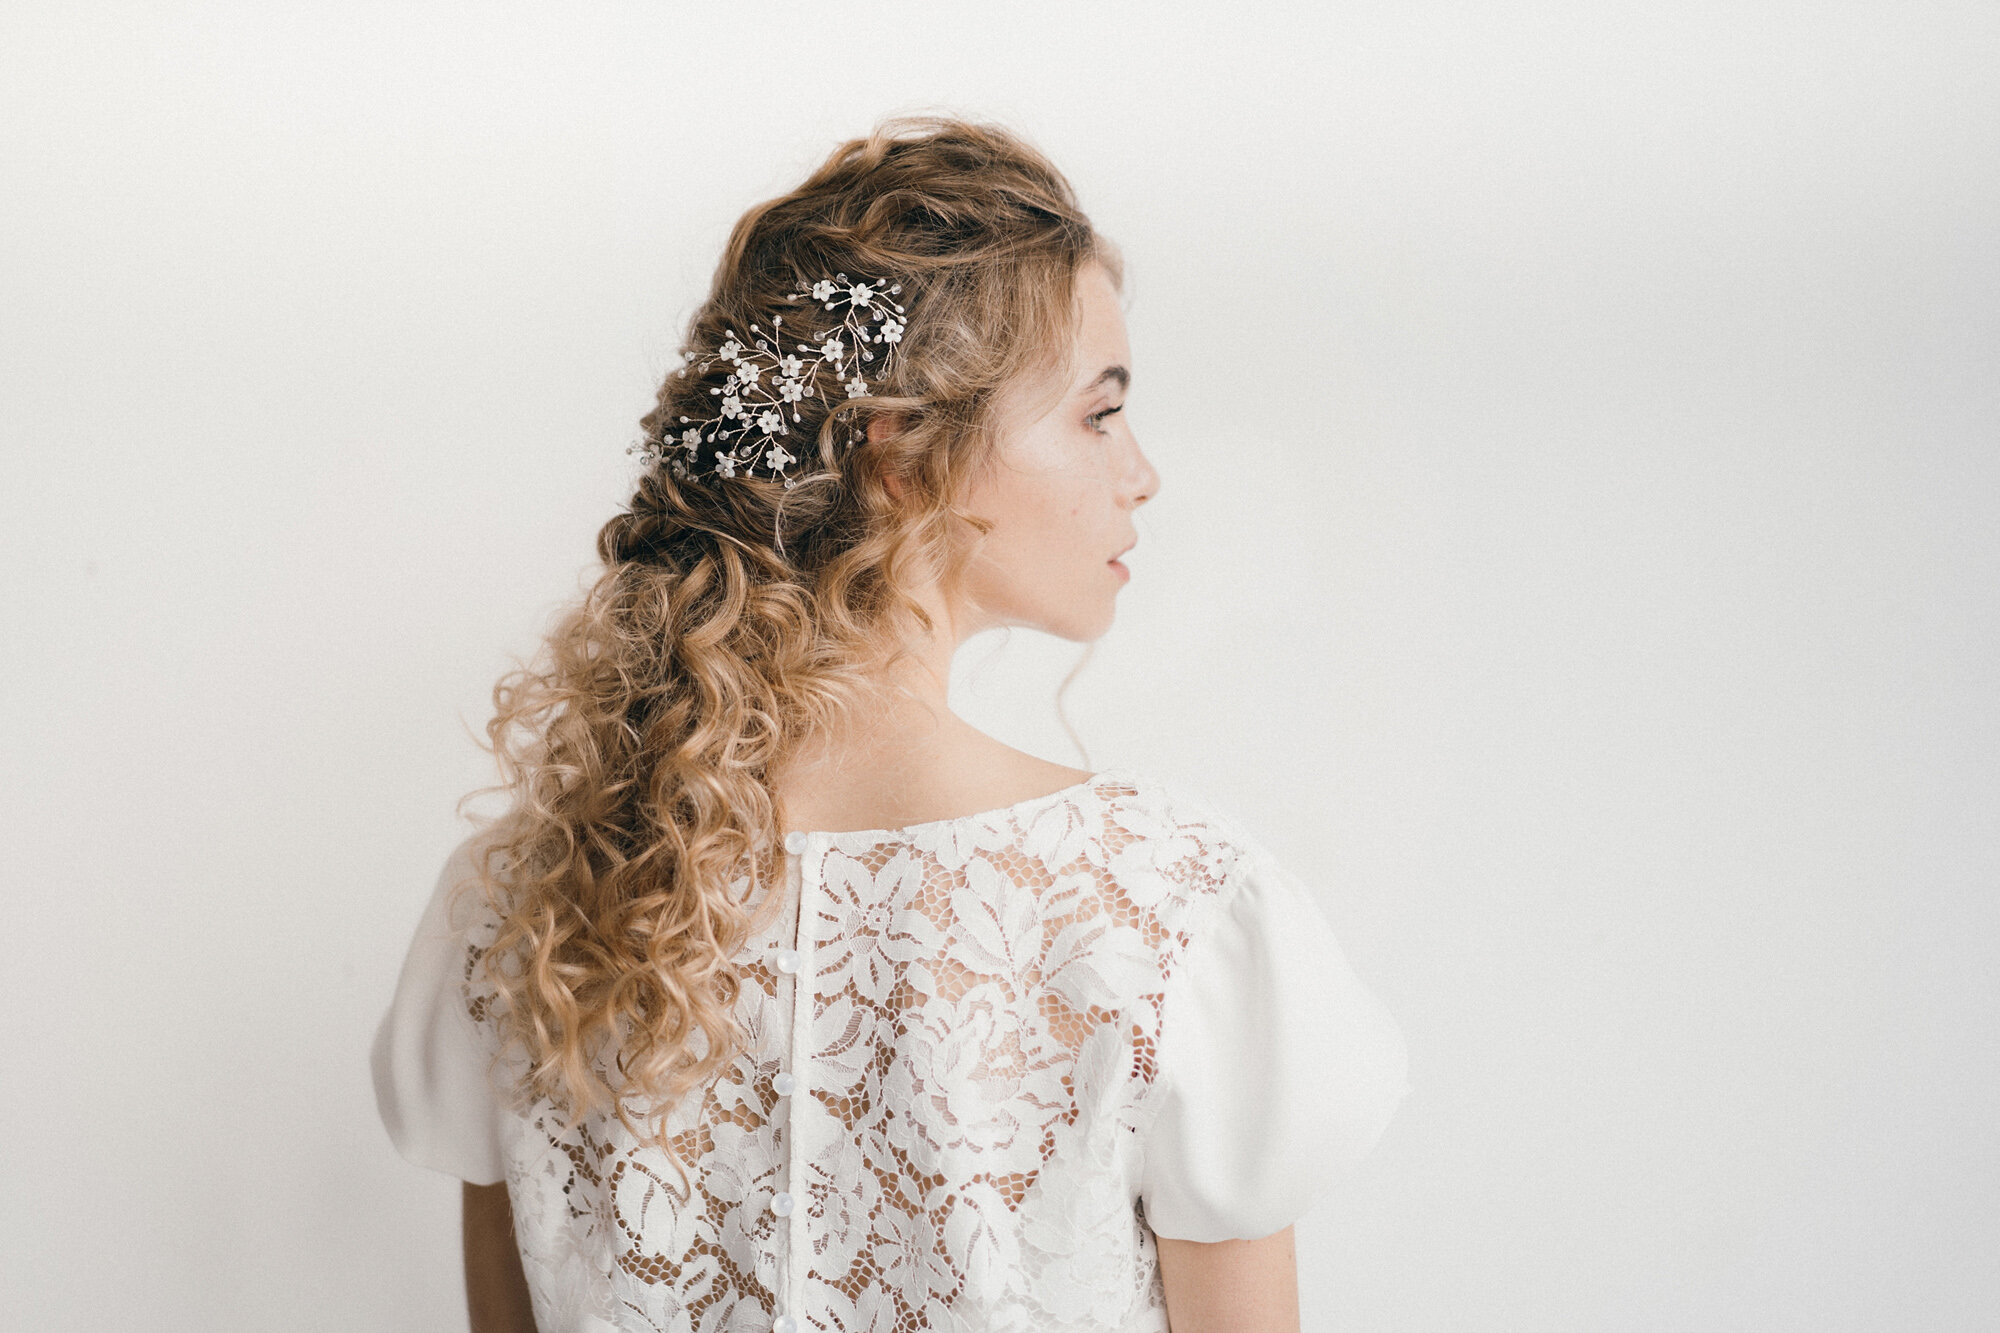 Debbie-Carlisle-Bridal-Accessories-Kate-Beaumont-Wedding-Gowns-Sheffield-Yorkshire-UK-34.jpg